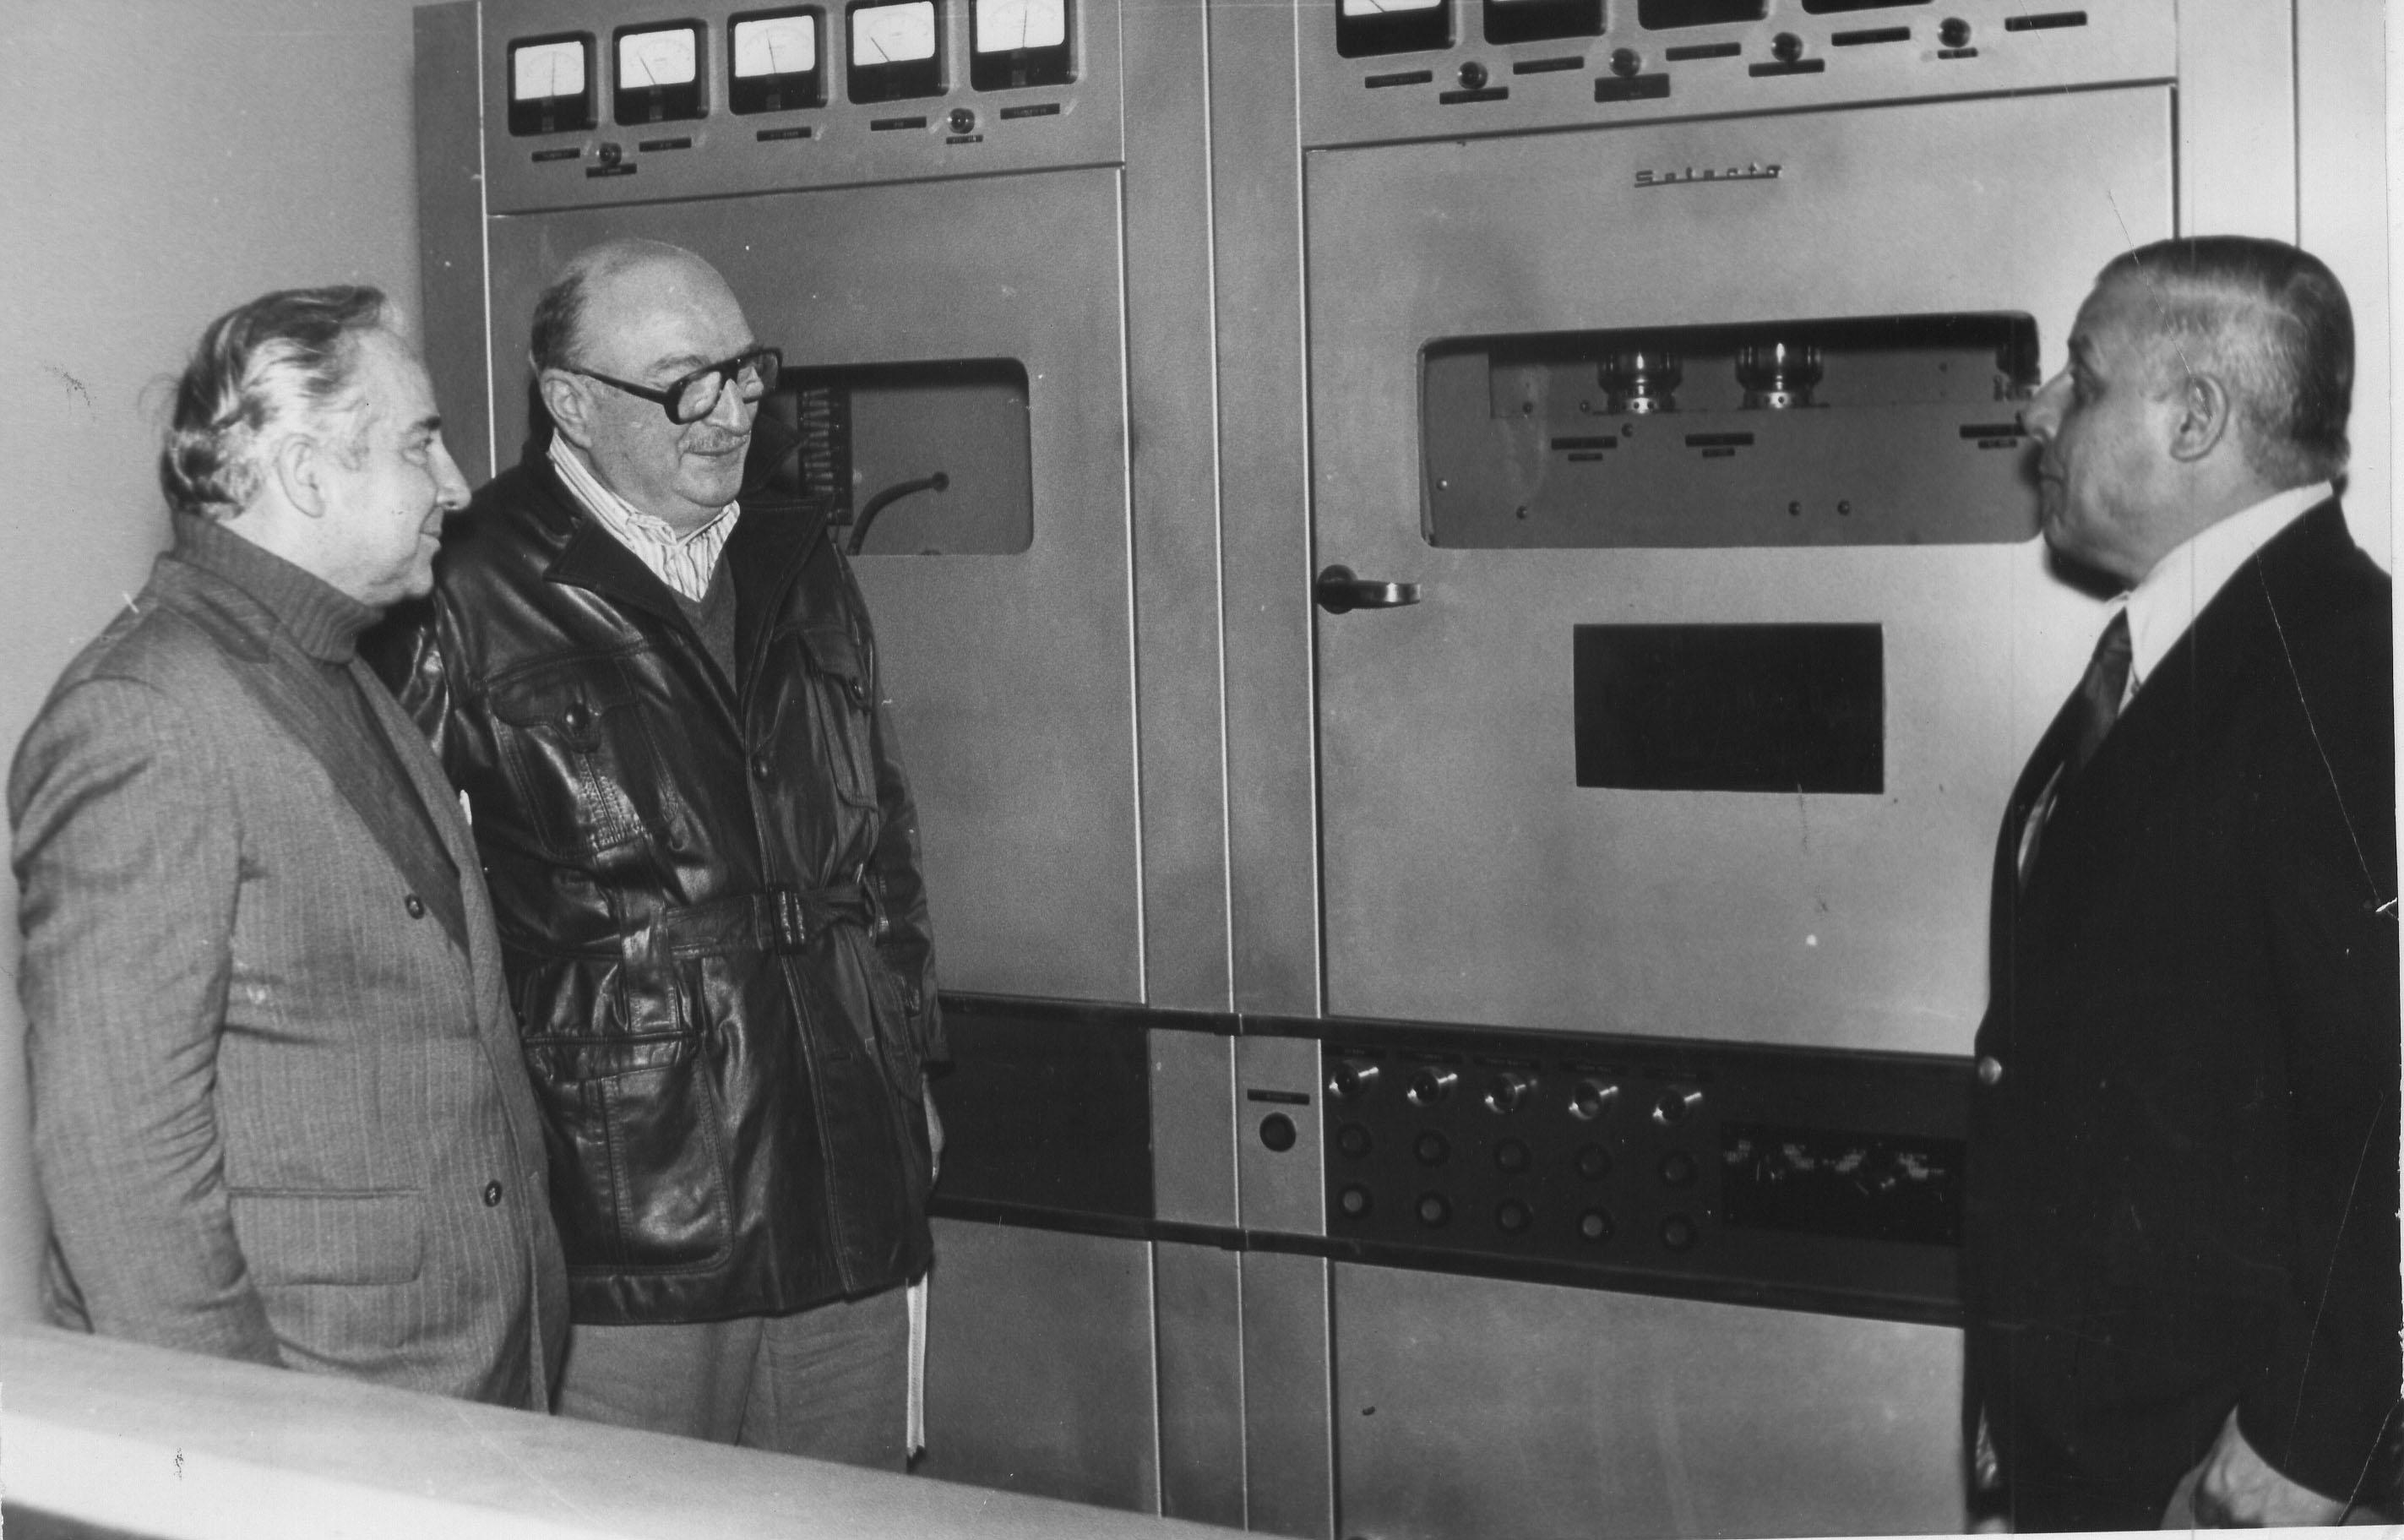 Alberto Segovia equipo transmisor reemplazado en 1965.